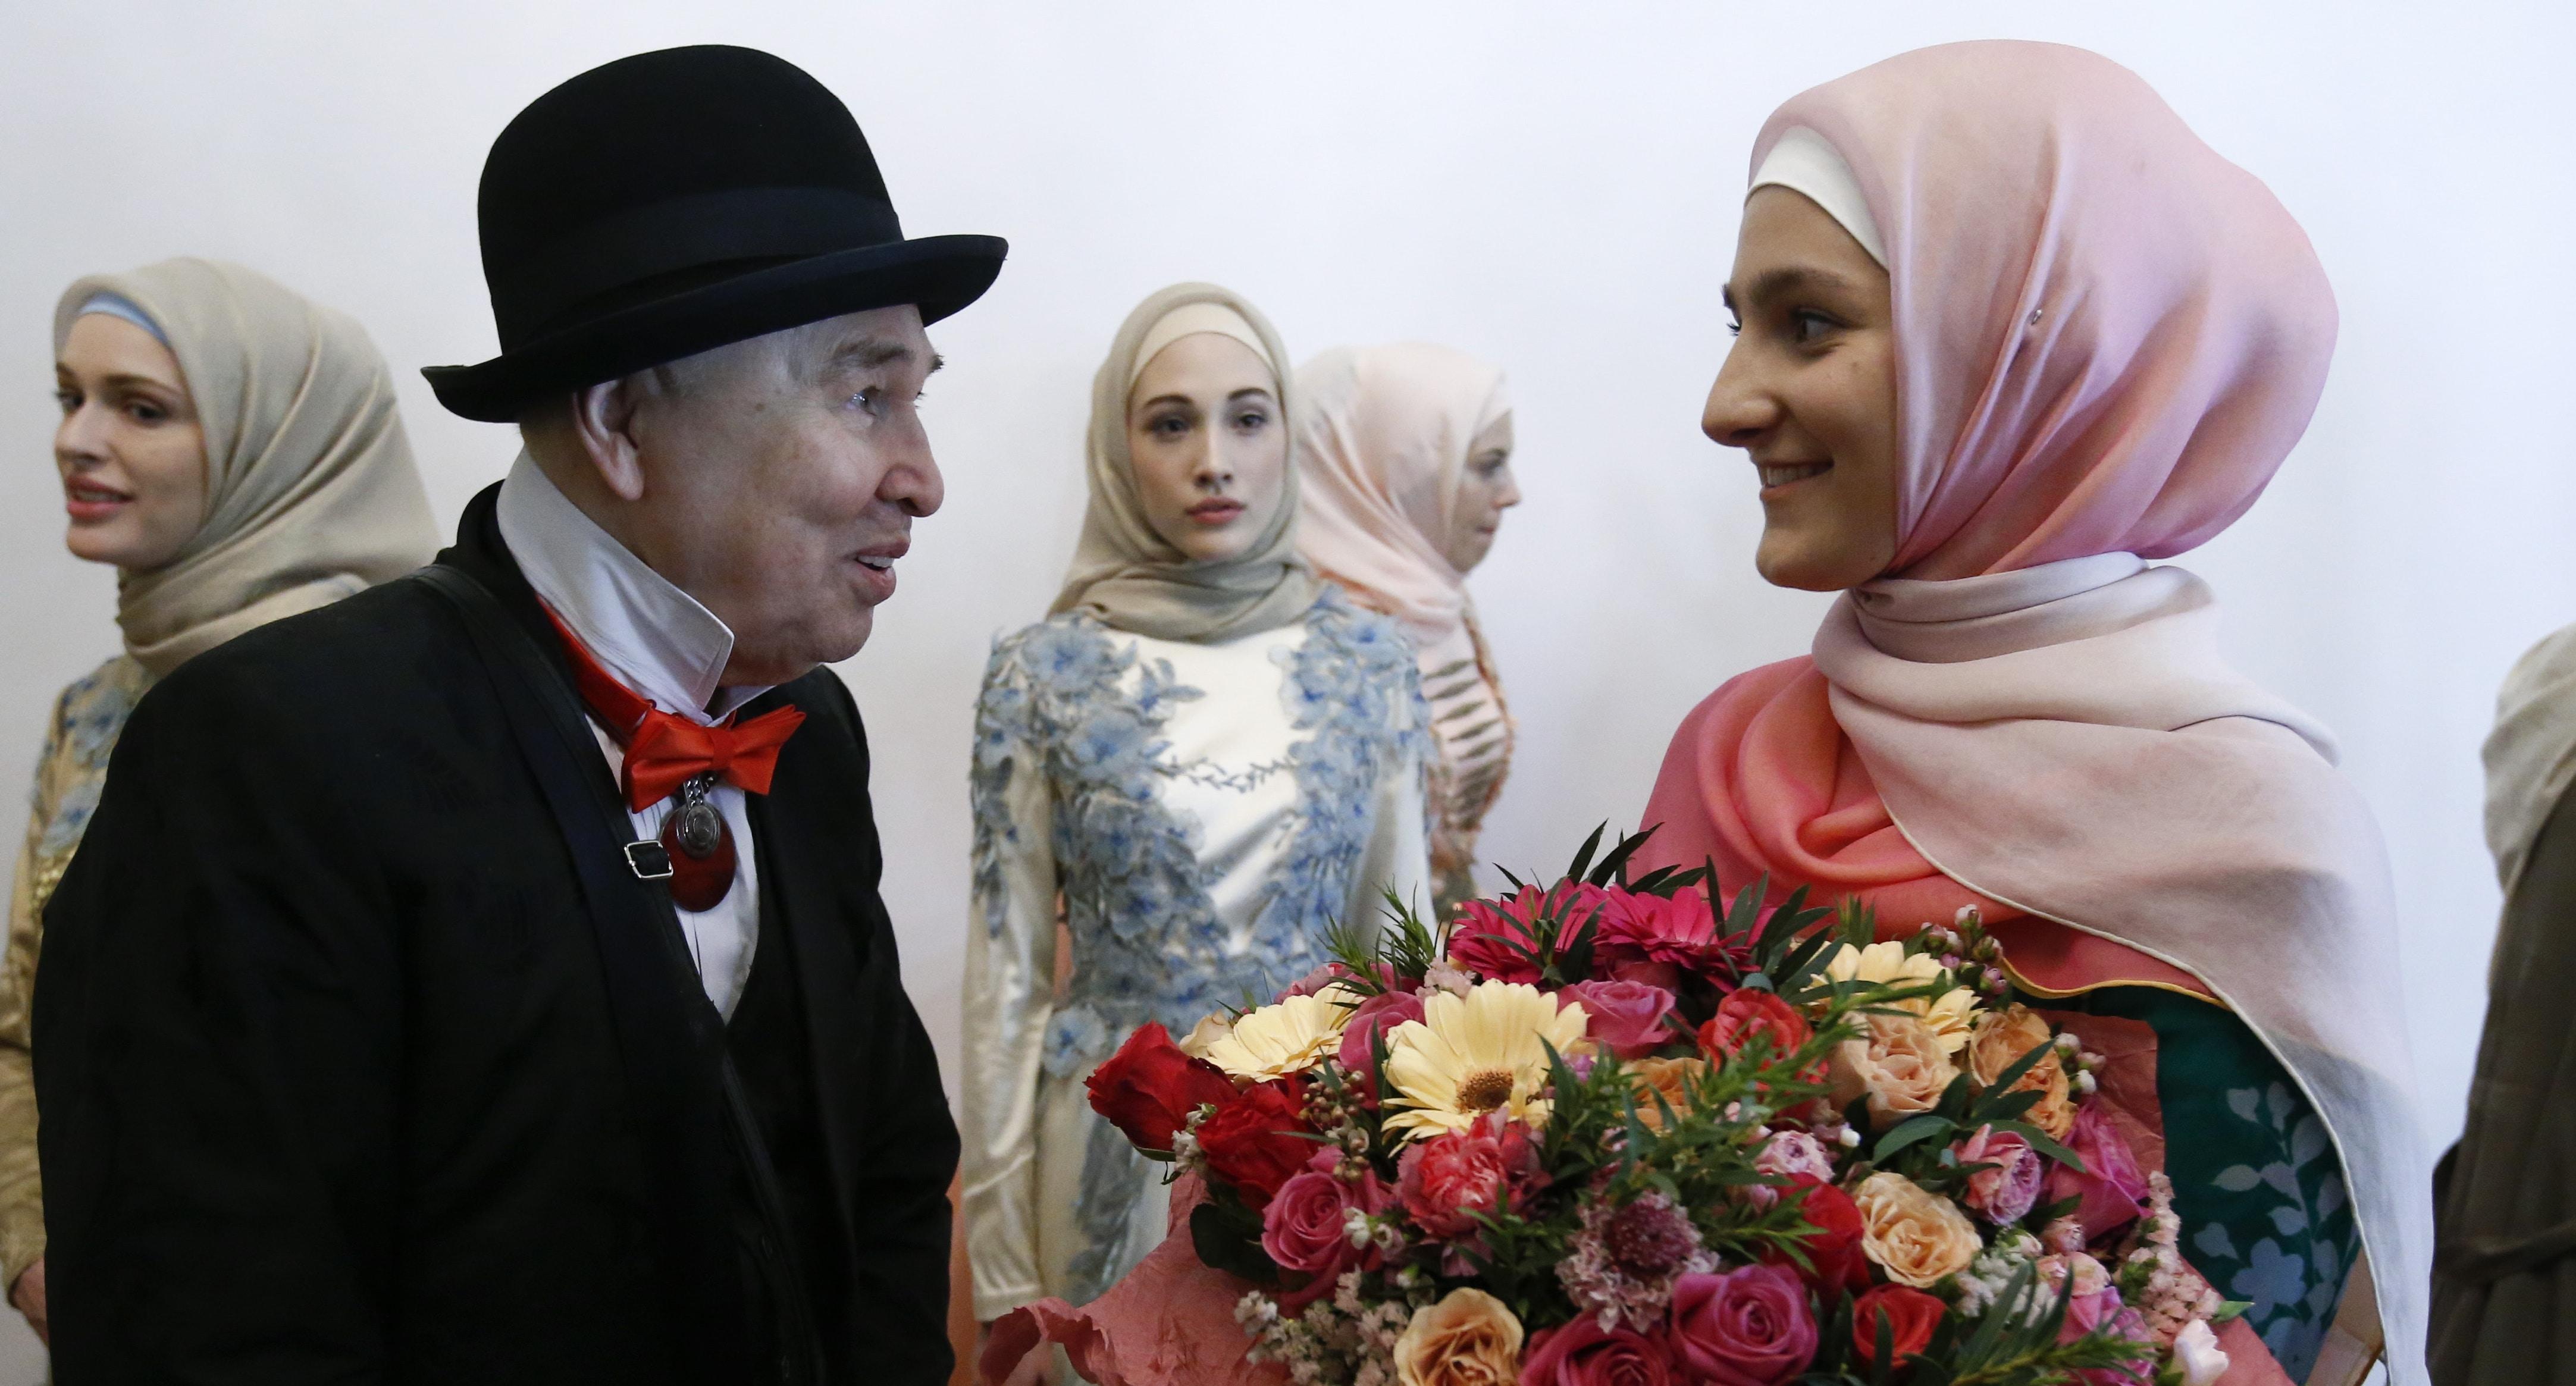 Дизайнер Слава Зайцев на встрече с дочерью Рамзана Кадырова Айшат. Фото: REUTERS/Sergei Karpukhin